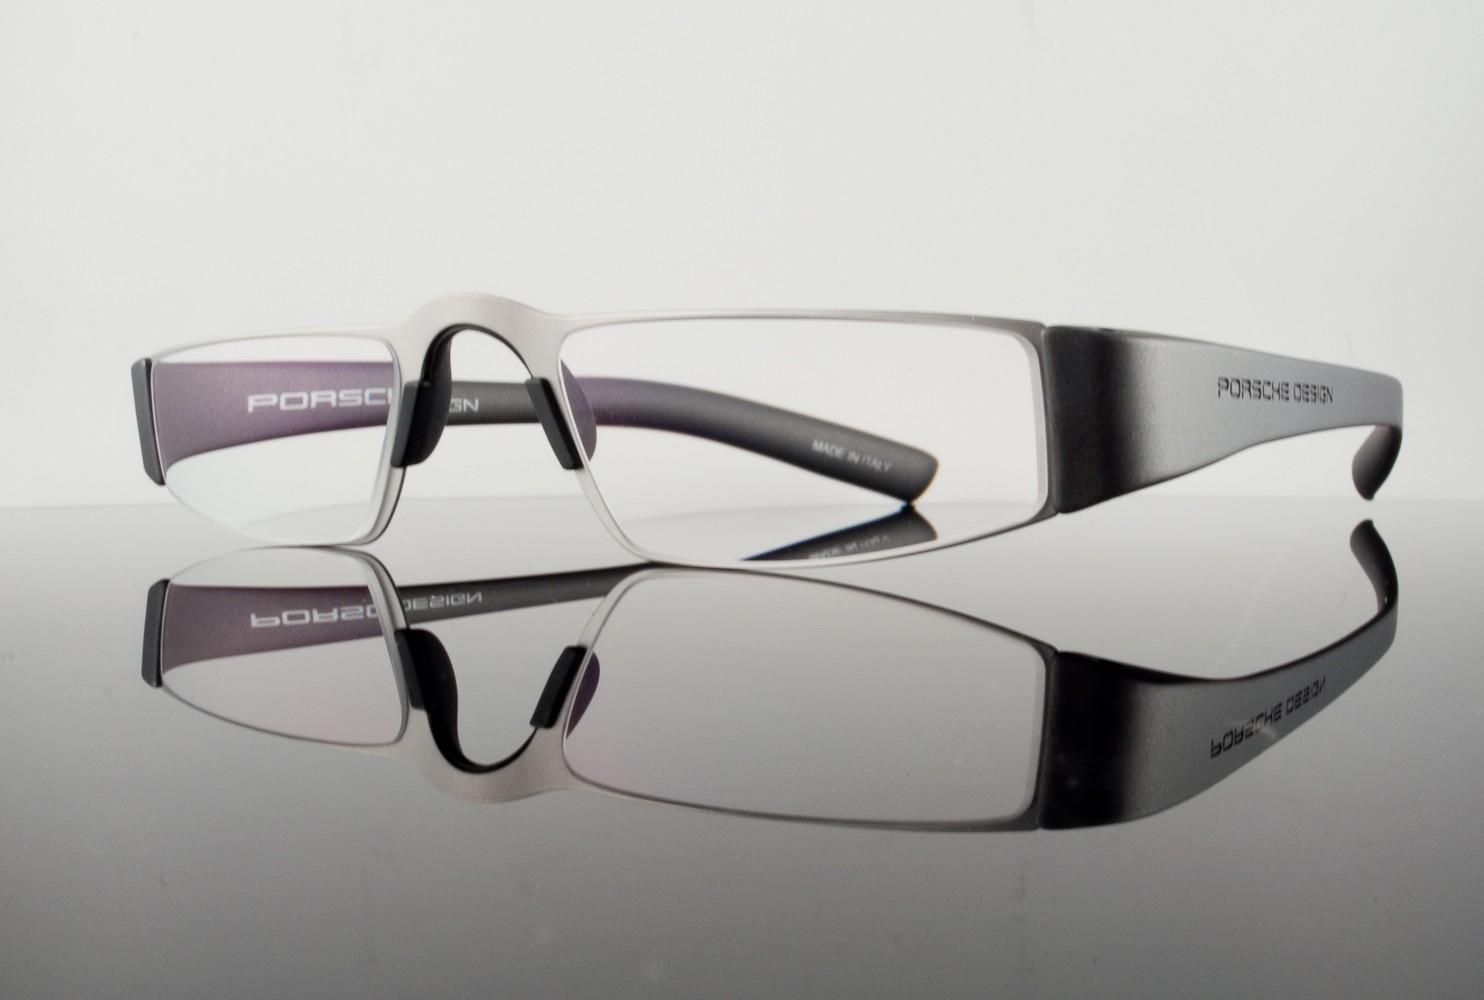 Porsche design очки 6 фотография